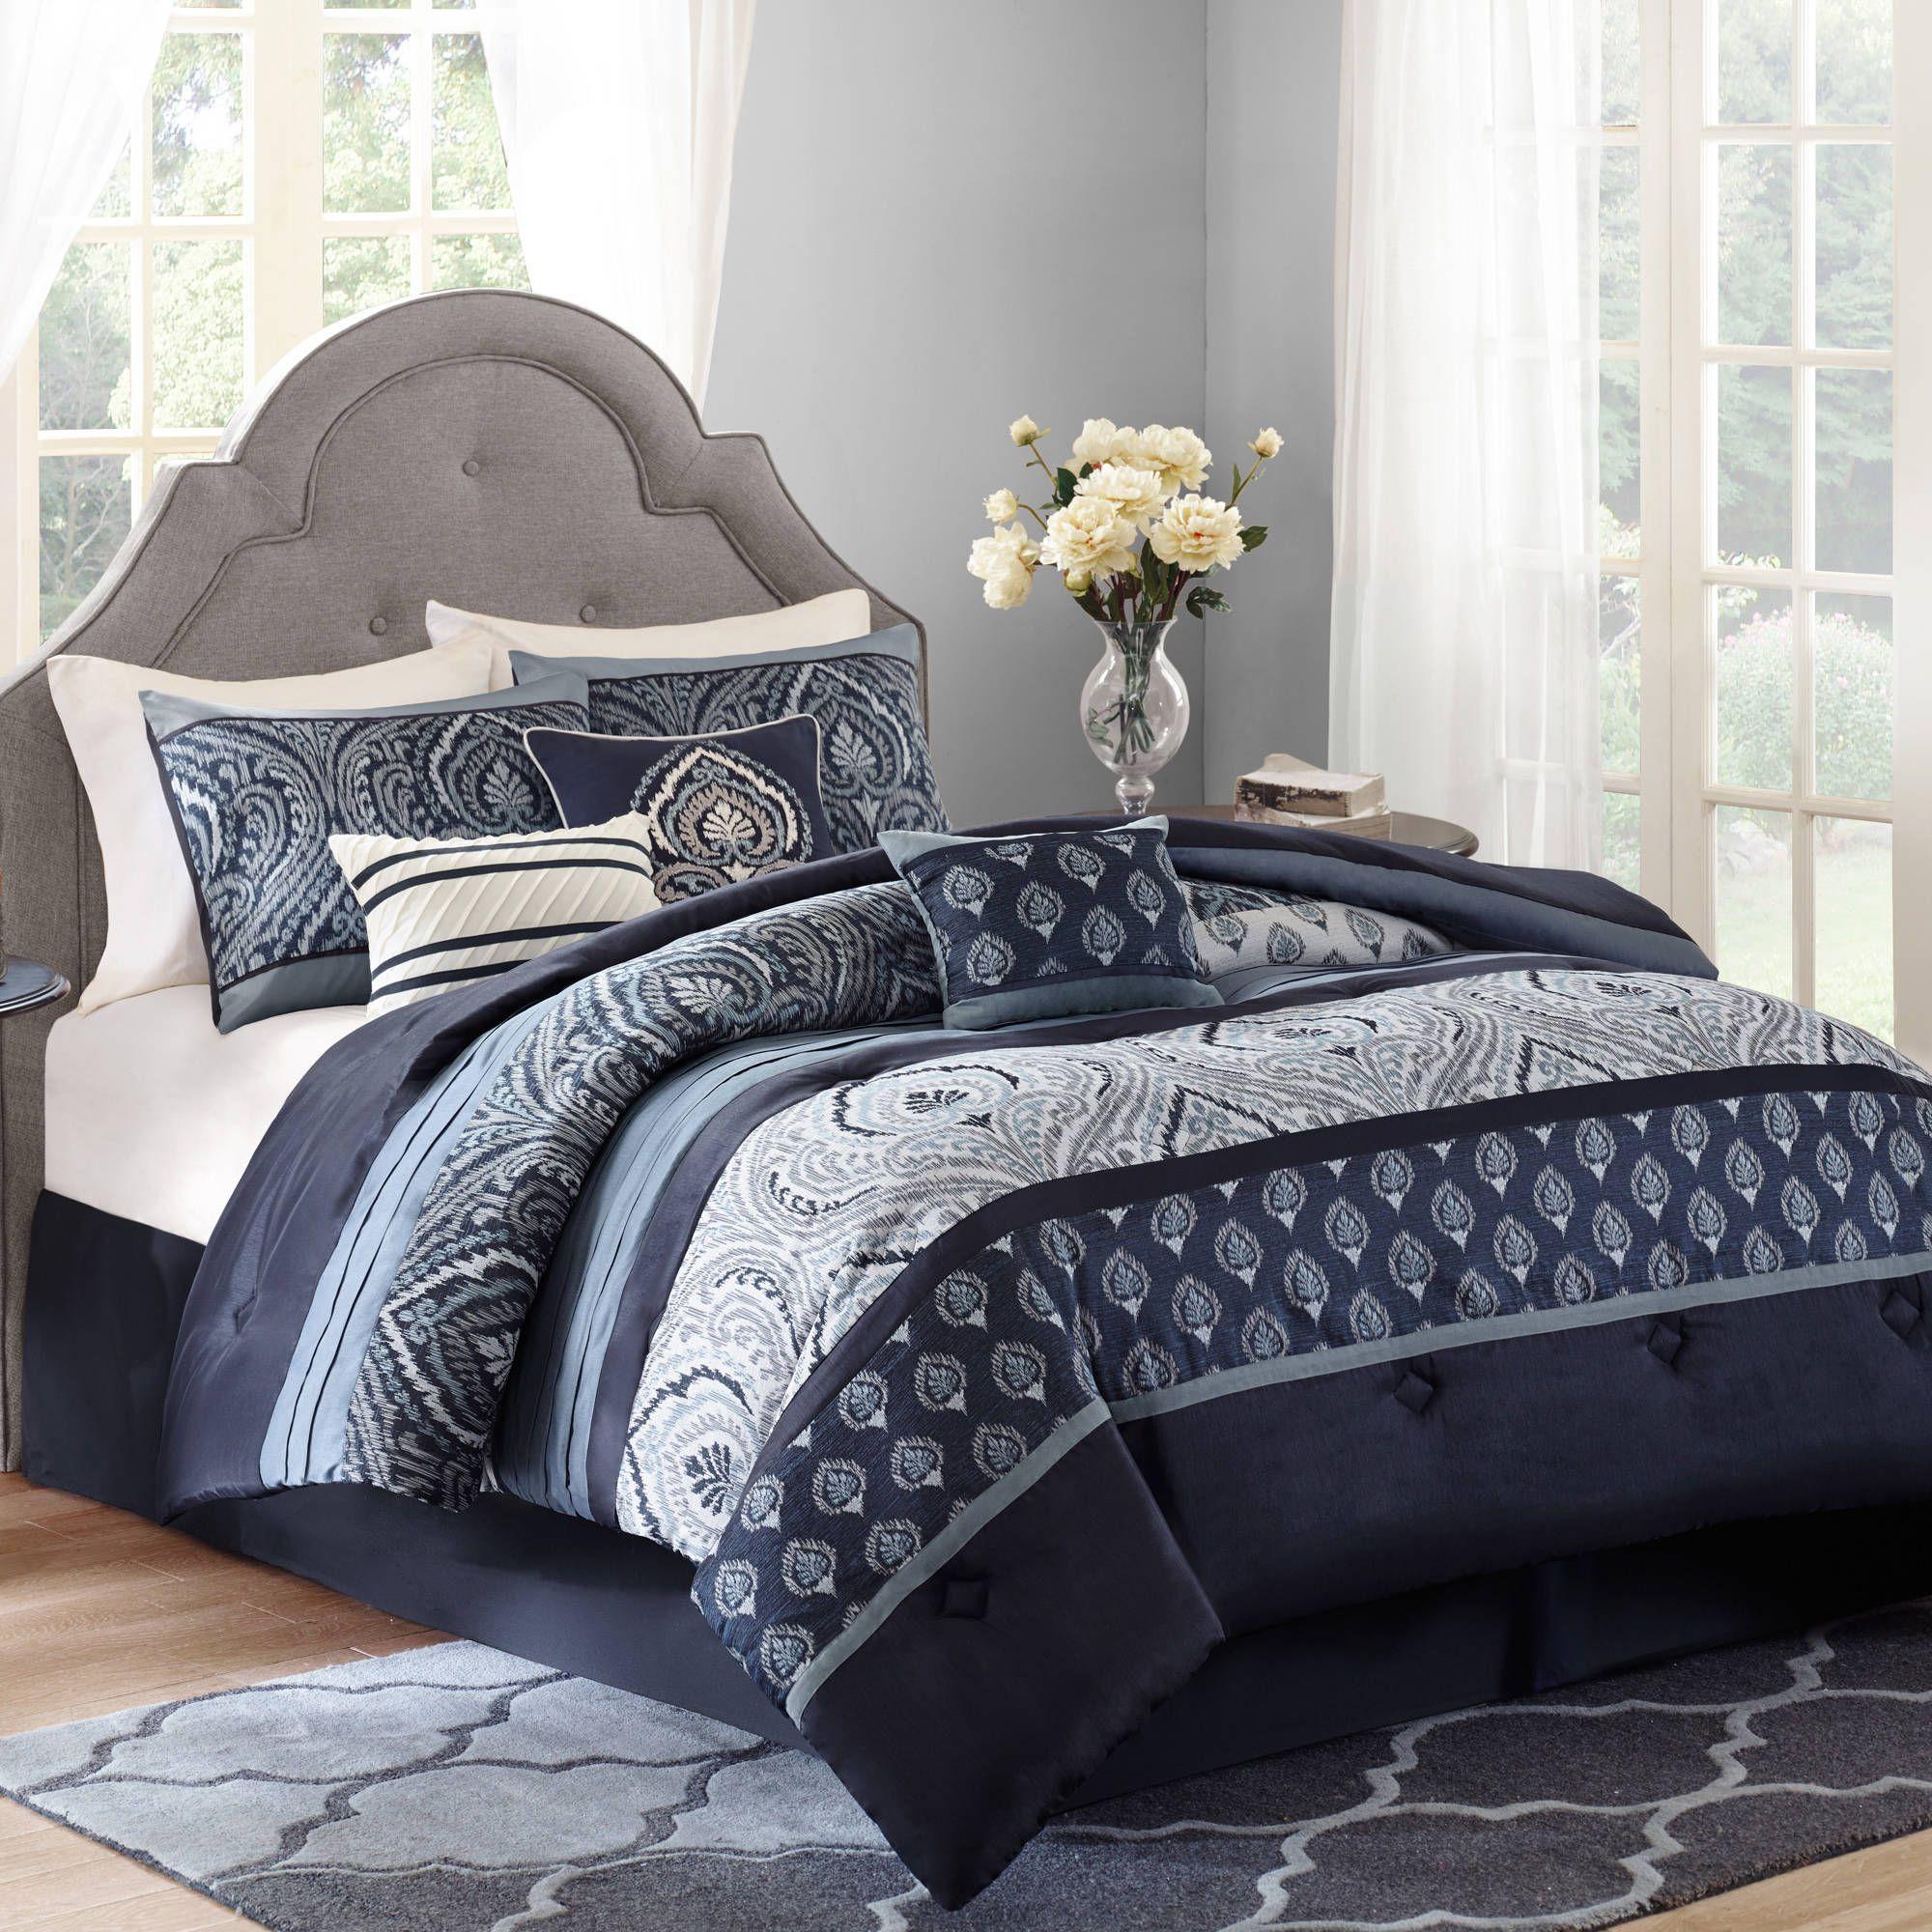 Queen Bedspreads Clearance Seprai